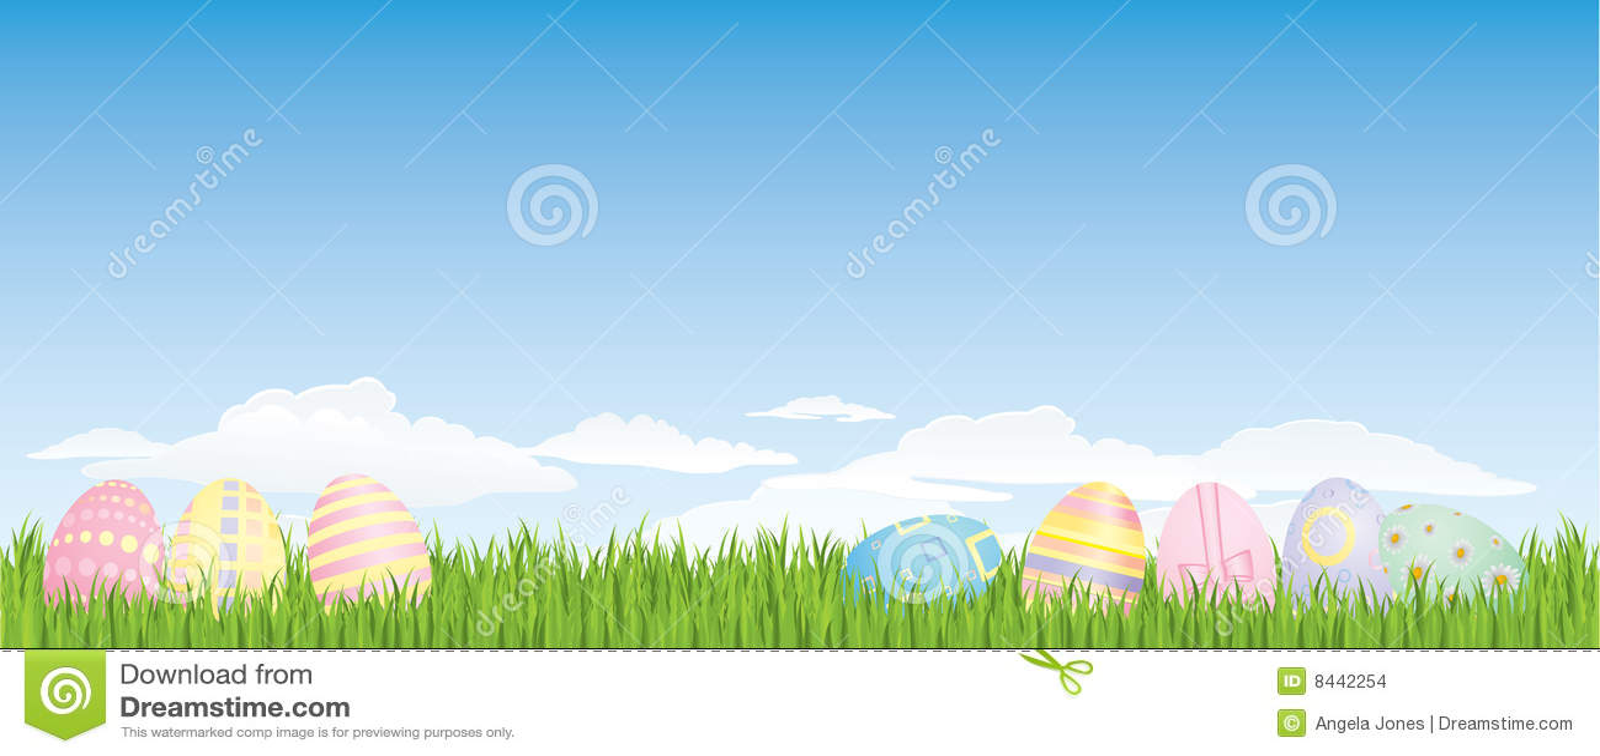 Fondo del huevo de Pascua